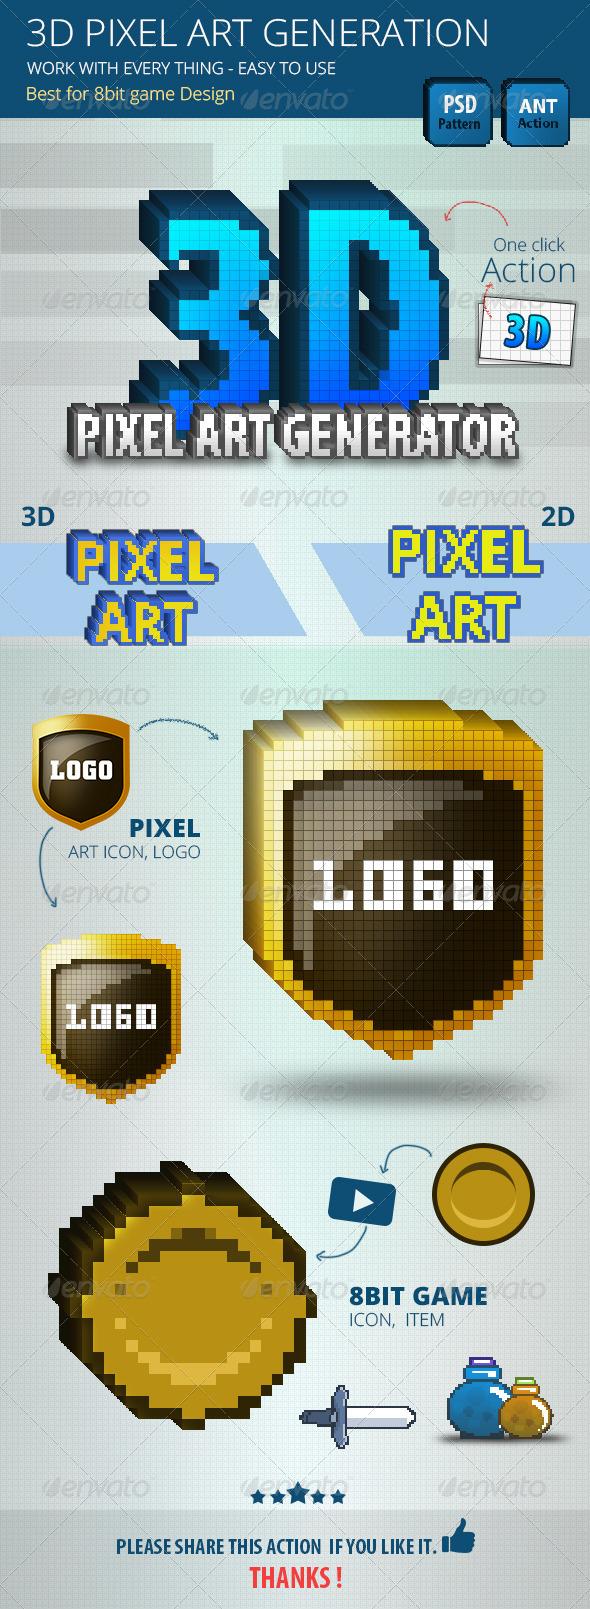 GraphicRiver 3D Pixel Art Generation 6944066